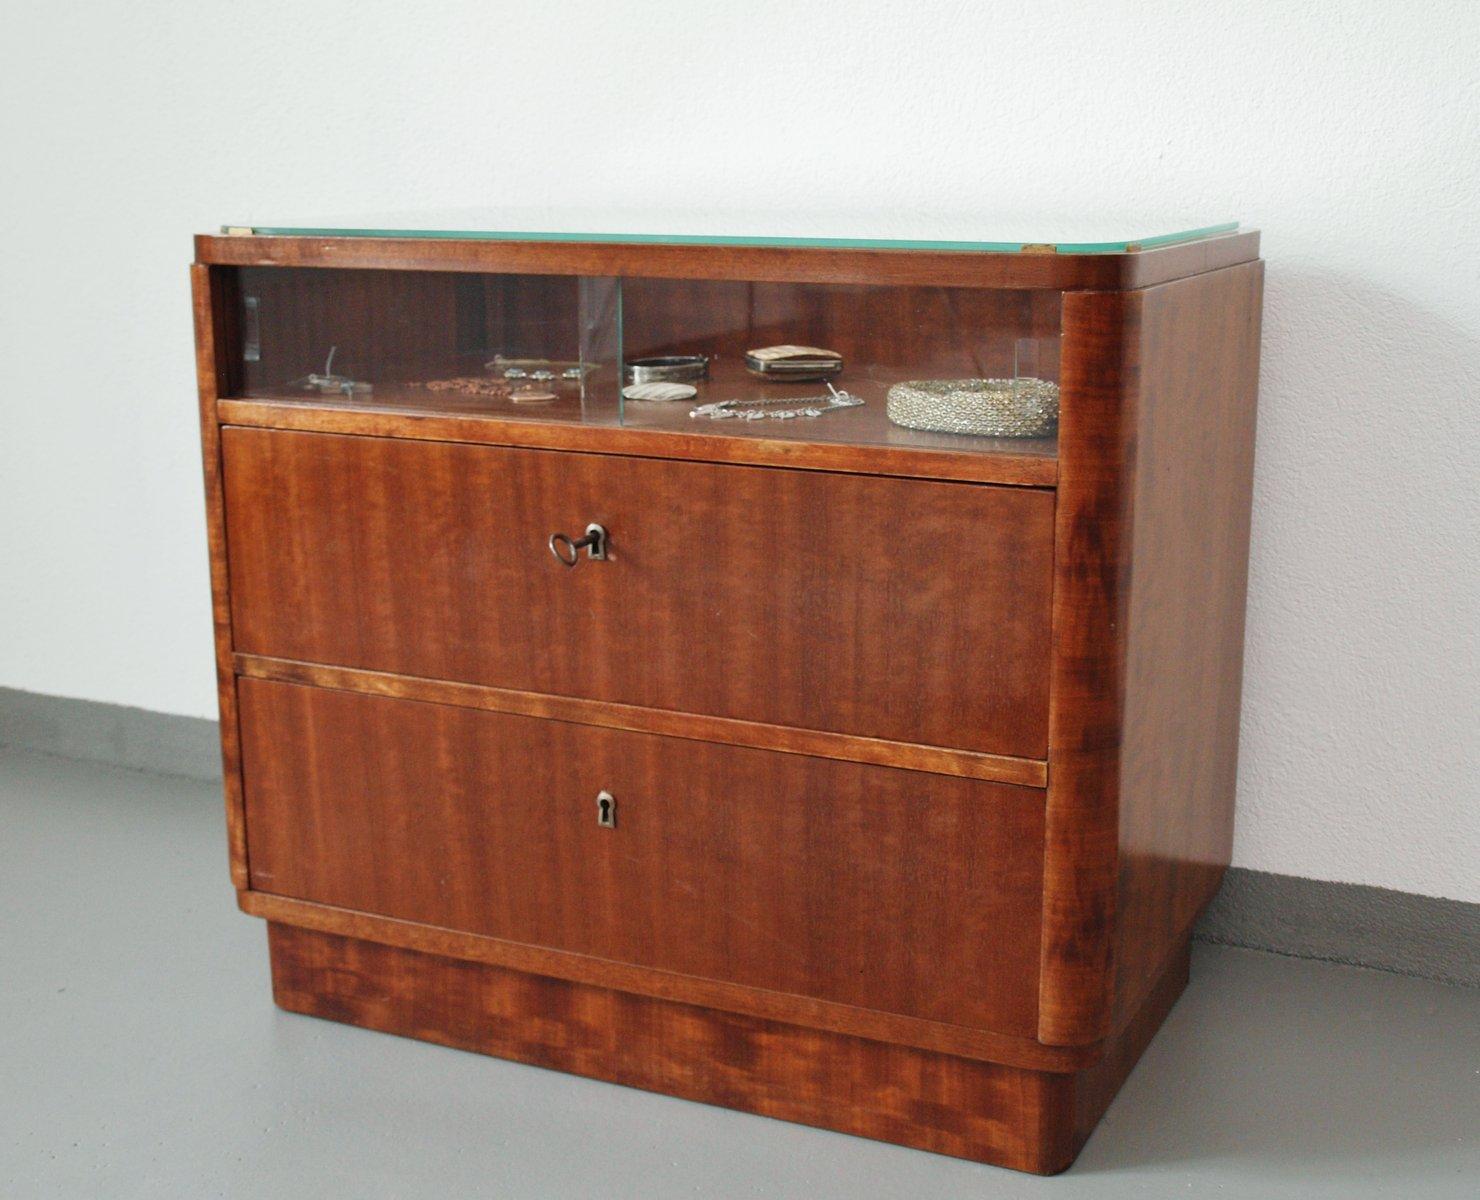 commode art deco en noyer allemagne 1935 en vente sur pamono. Black Bedroom Furniture Sets. Home Design Ideas